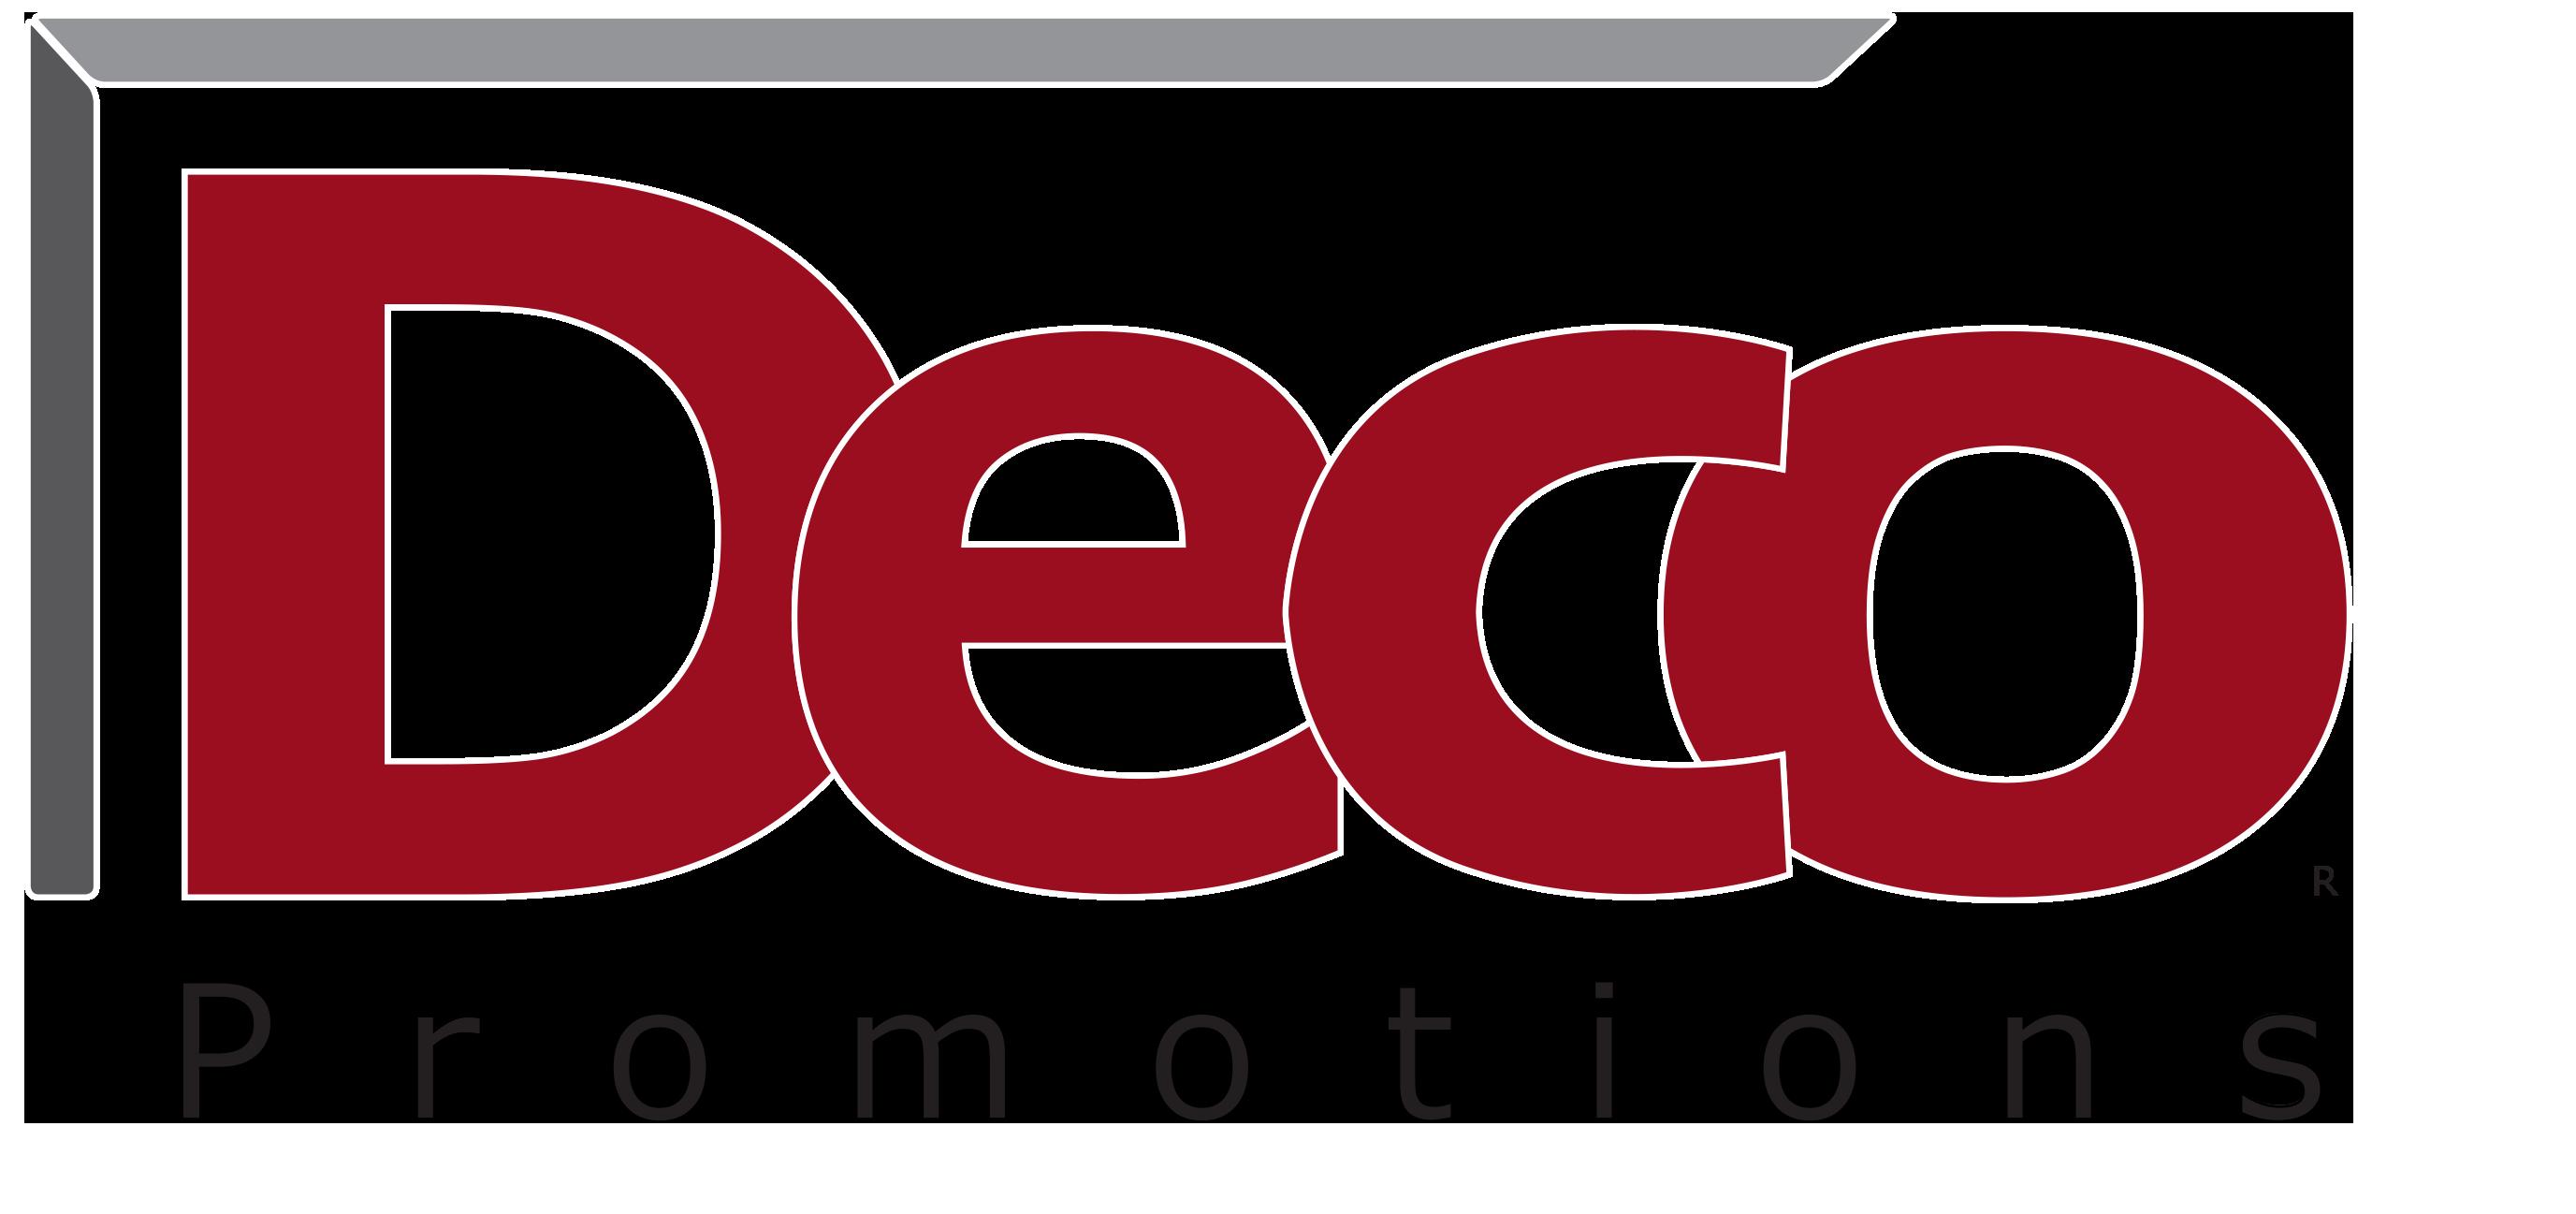 Deco Promotional Materials Logo